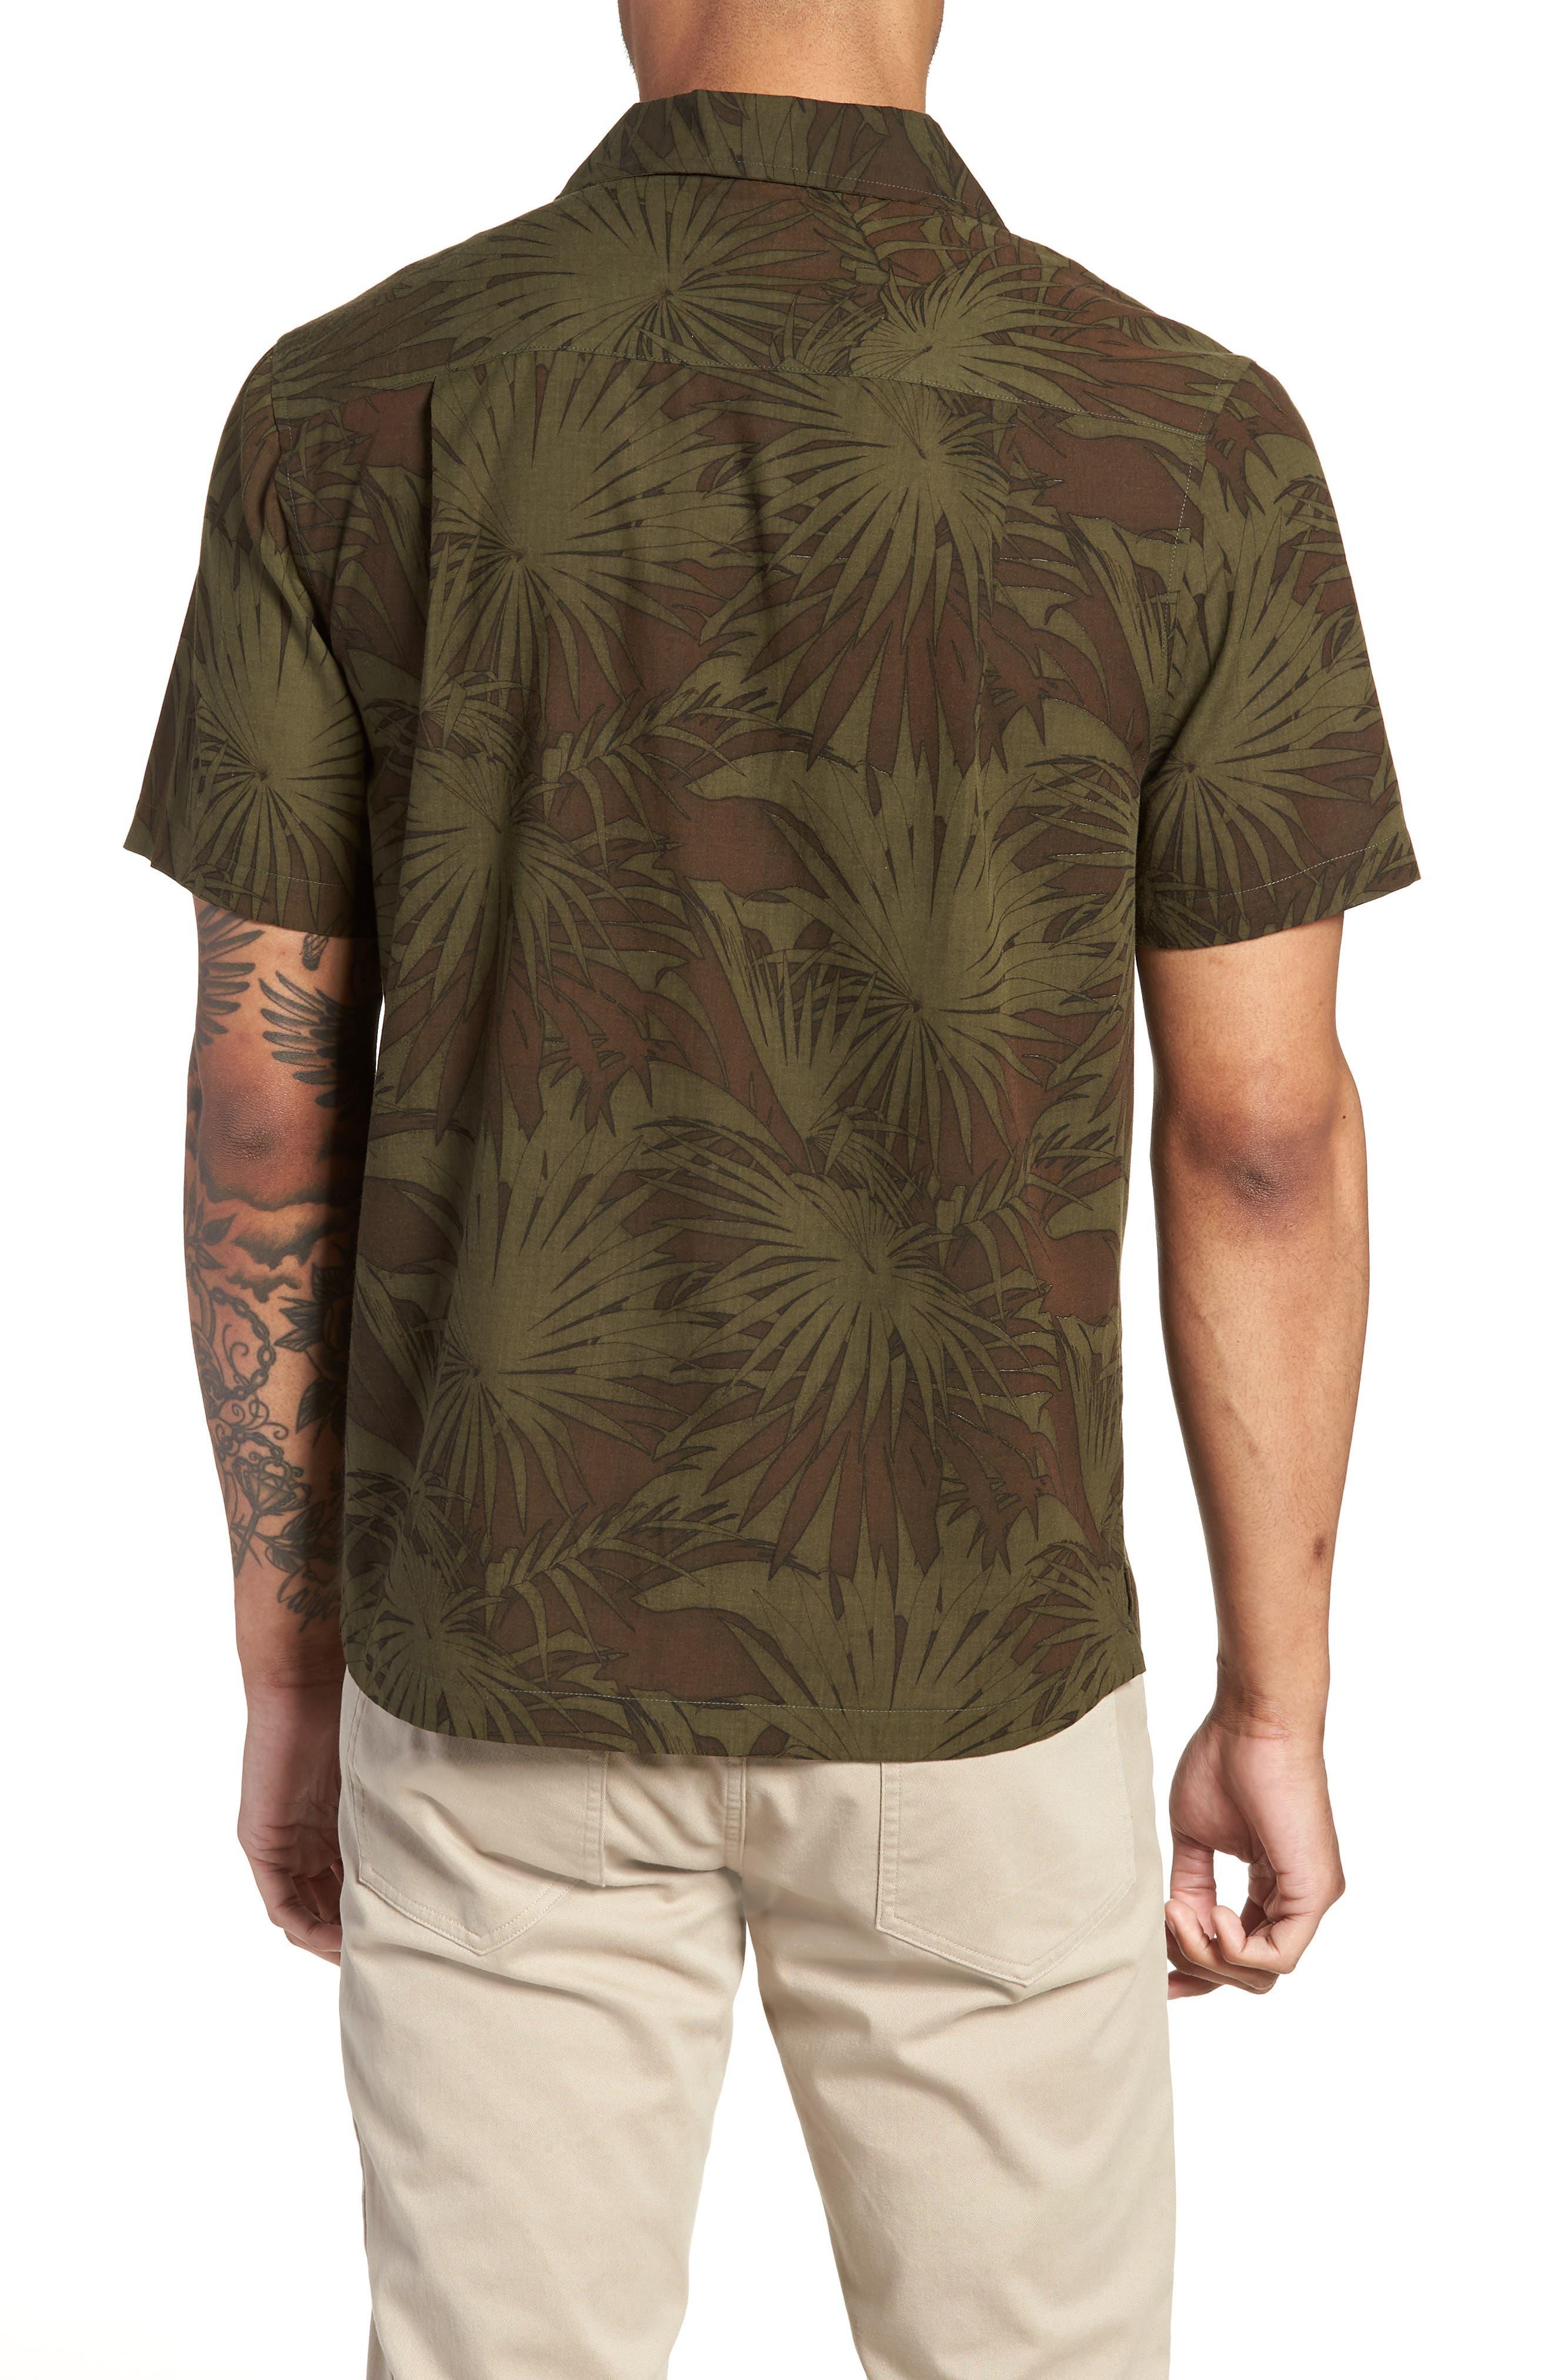 Palm Leaf Cabana Woven Shirt,                             Alternate thumbnail 2, color,                             FOLIAGE/ DRIED HERB